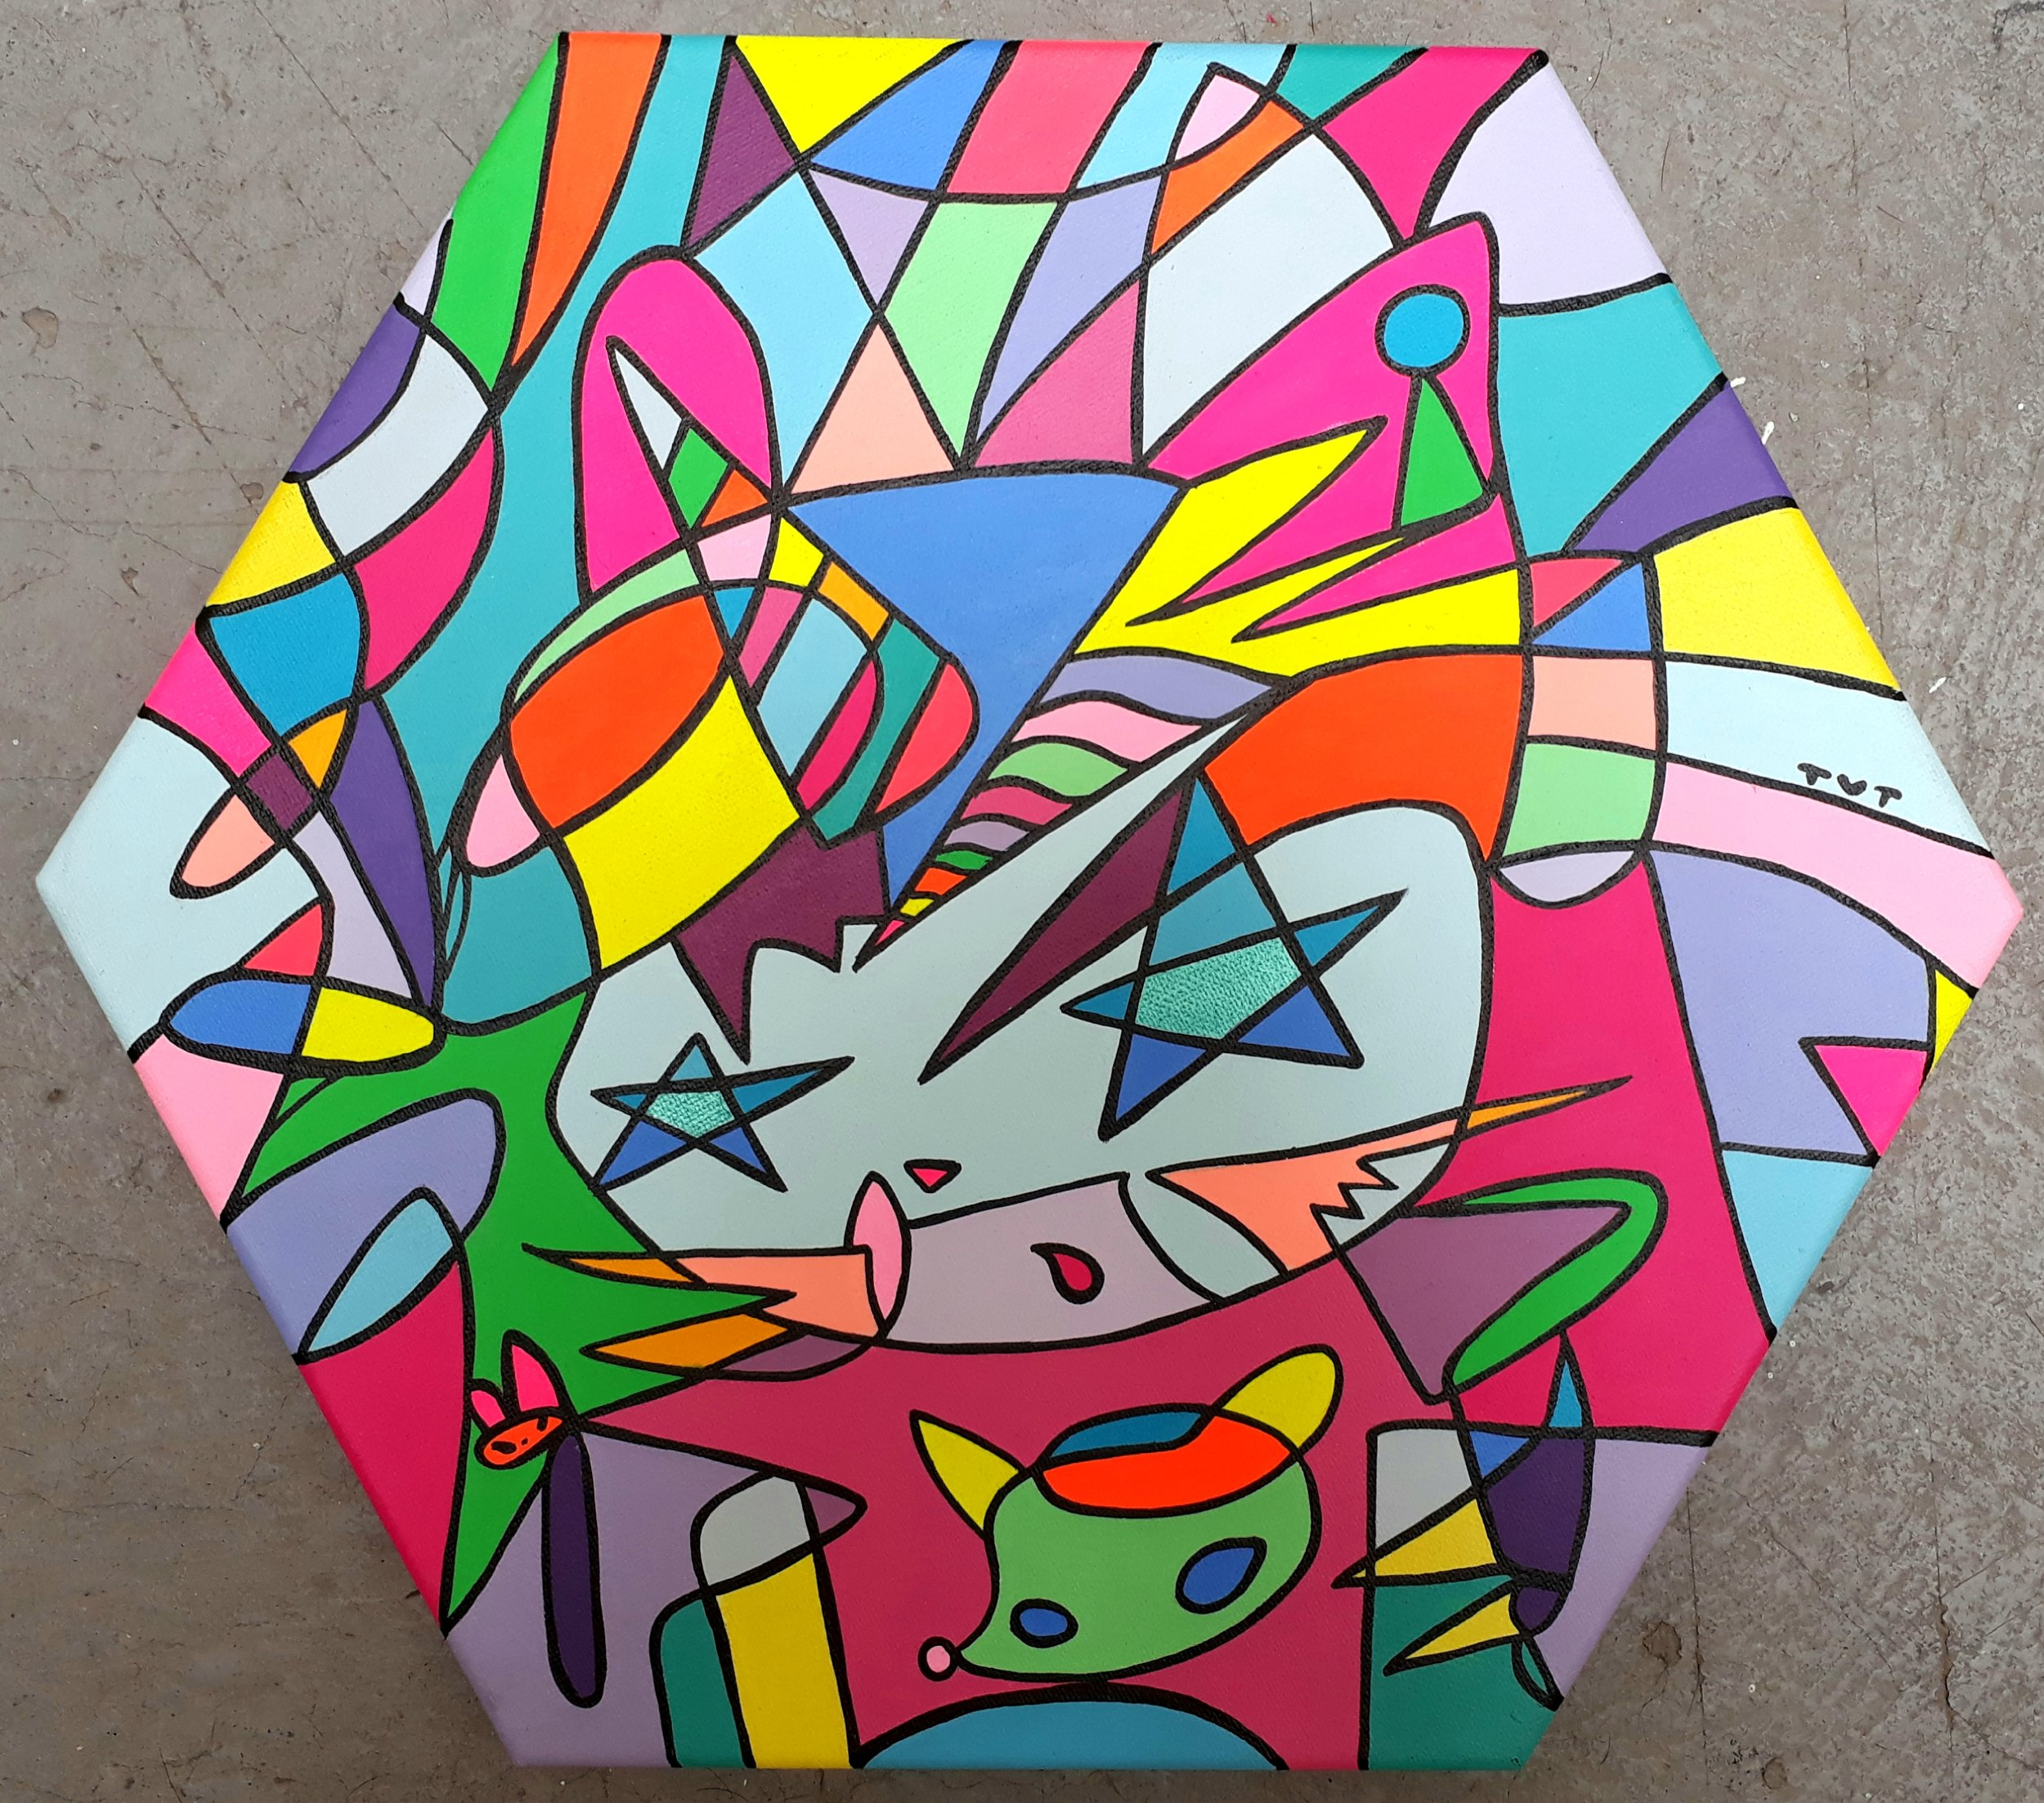 S.T (2018) -  35 x 40 cm - Acrilico sobre lienzo / Acrylic on canvas